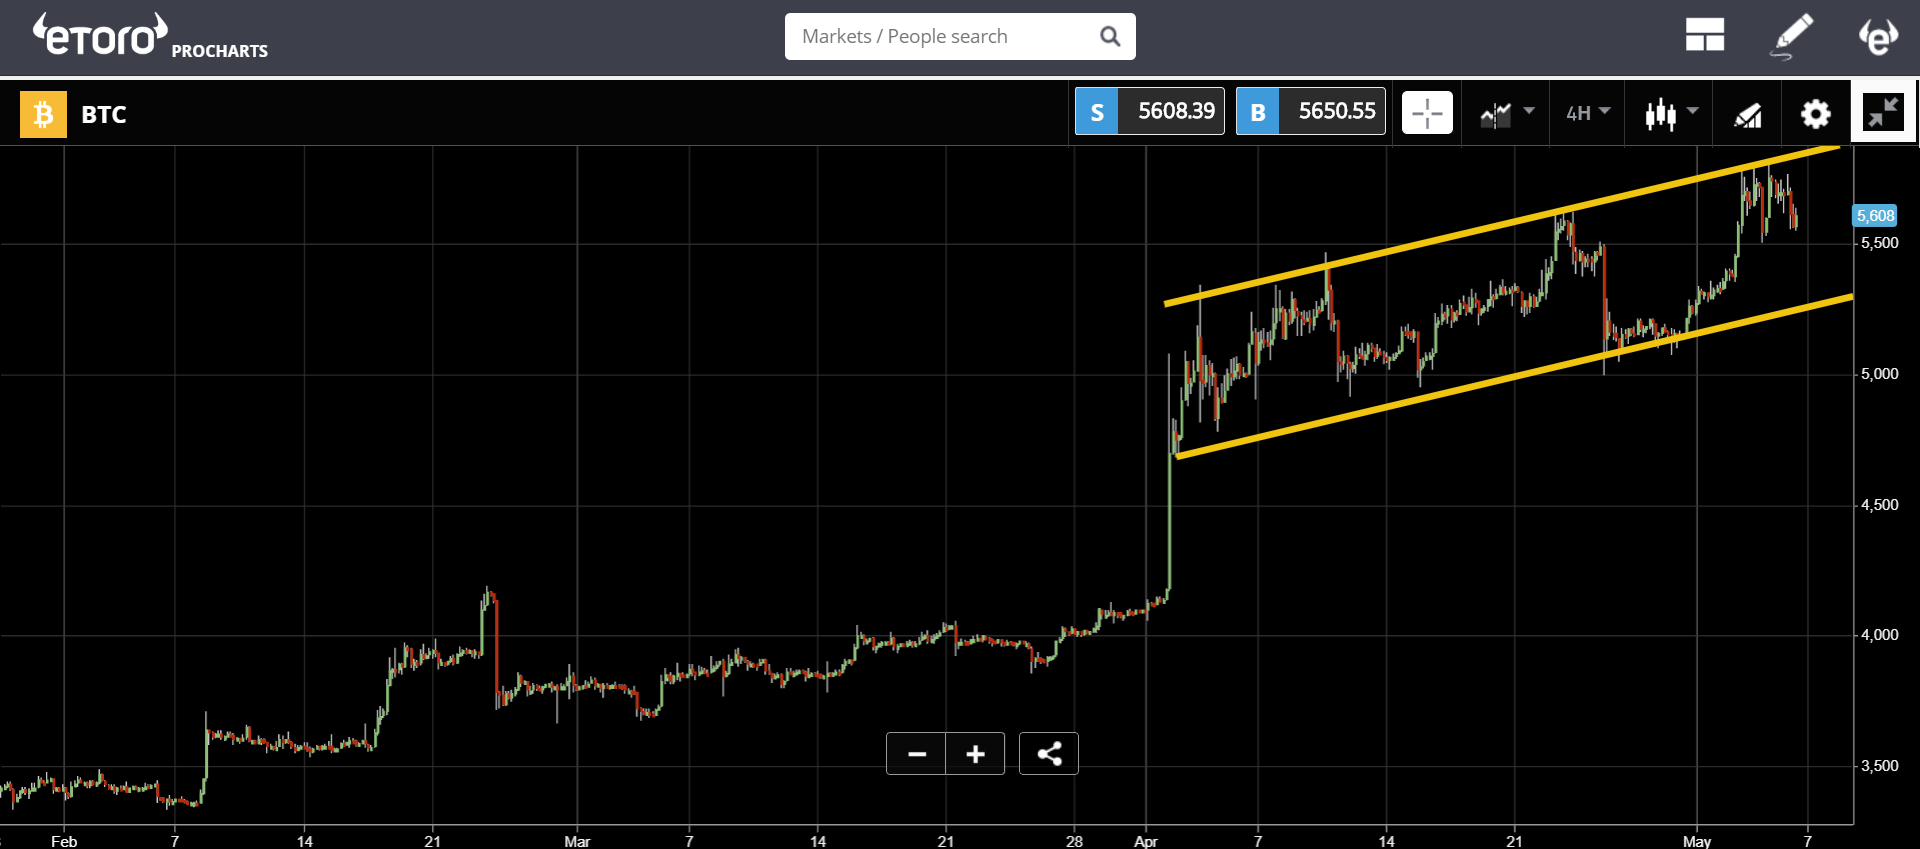 market, trading, bitcoin, ethereum, blockchain, stocks